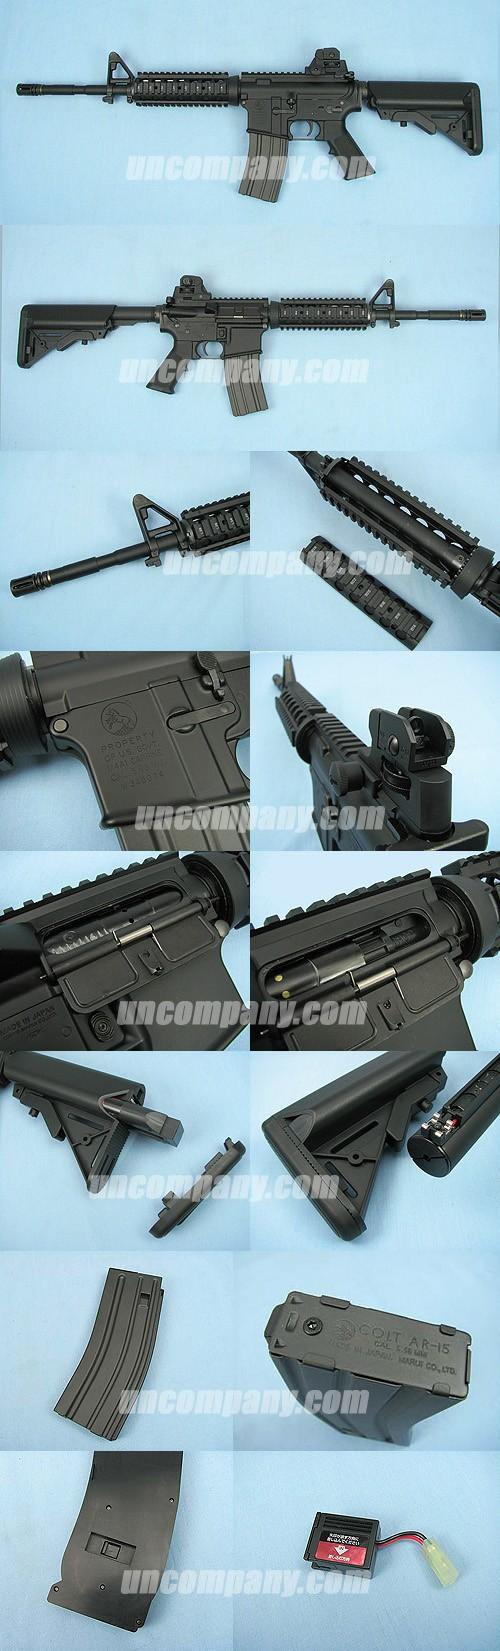 Marui SOPMOD M4 AEG (Blow Back) Mu-aeg10